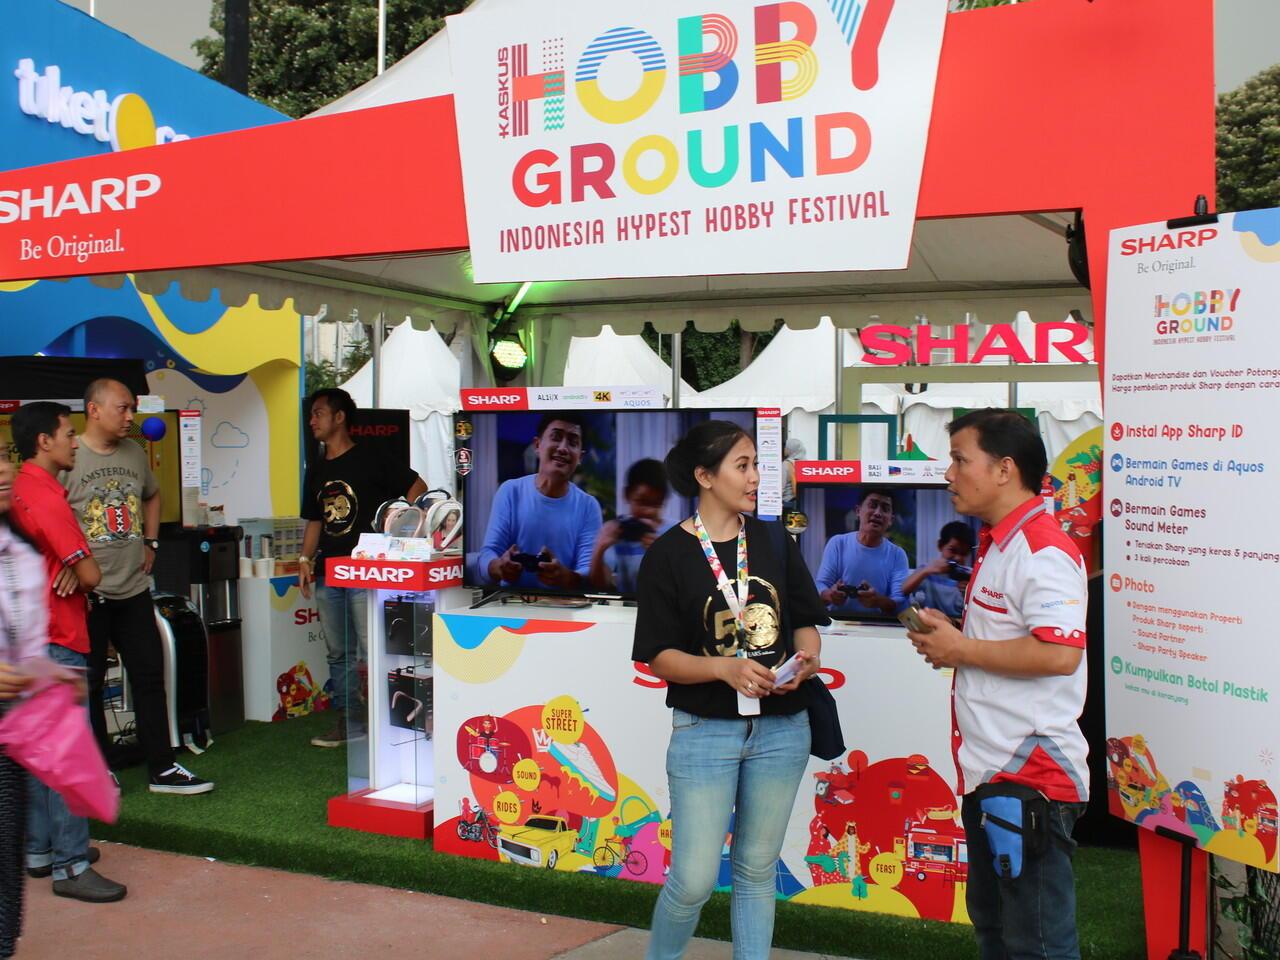 Ramaikan KASKUS HobbyGround, Sharp Ajak Pengunjung Lebih Peduli Lingkungan